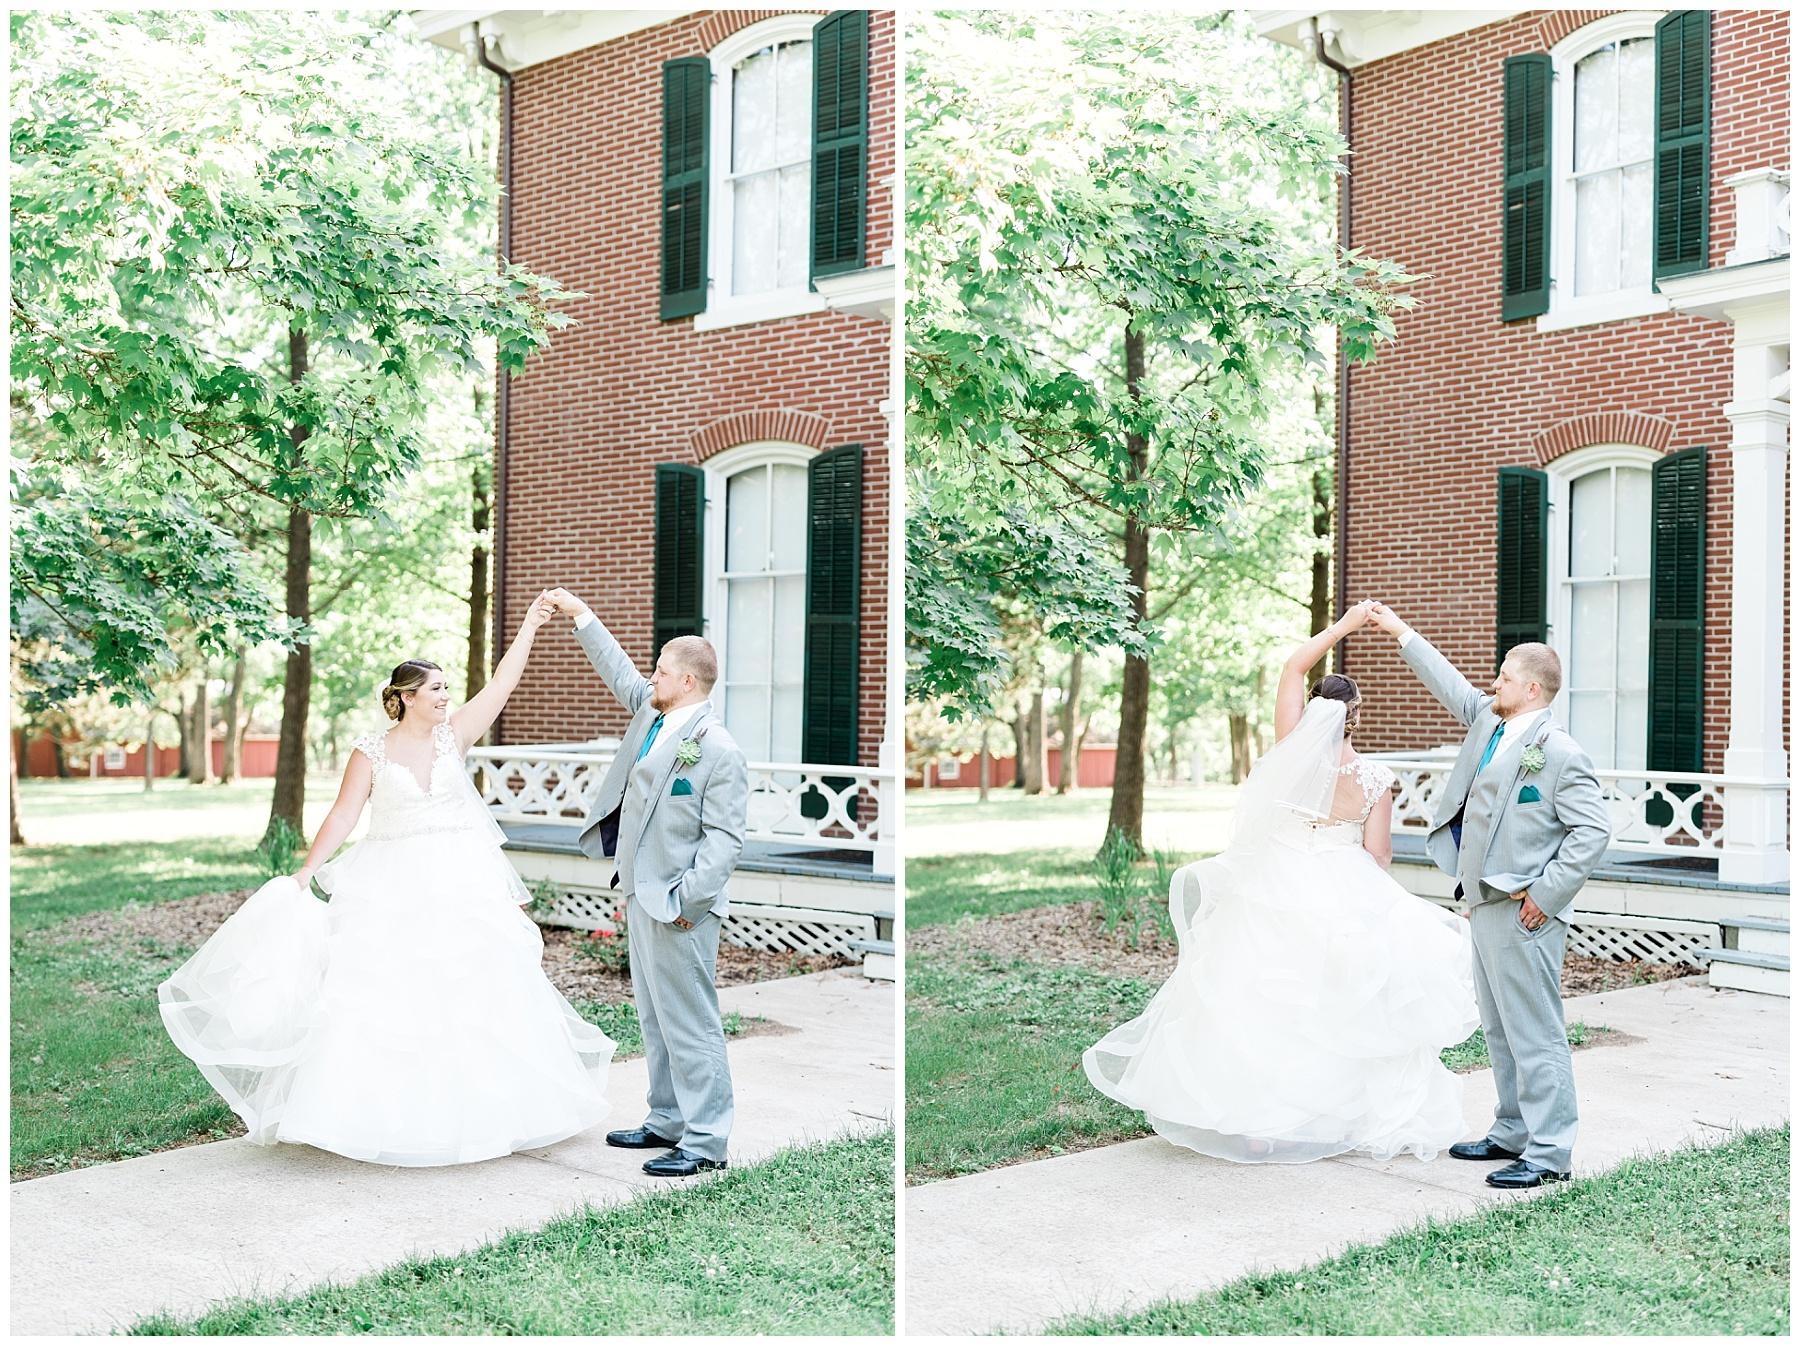 Baurichter Wedding at Stoney Creek Inn Columbia Missouri by Kelsi Kliethermes Photography_0021.jpg